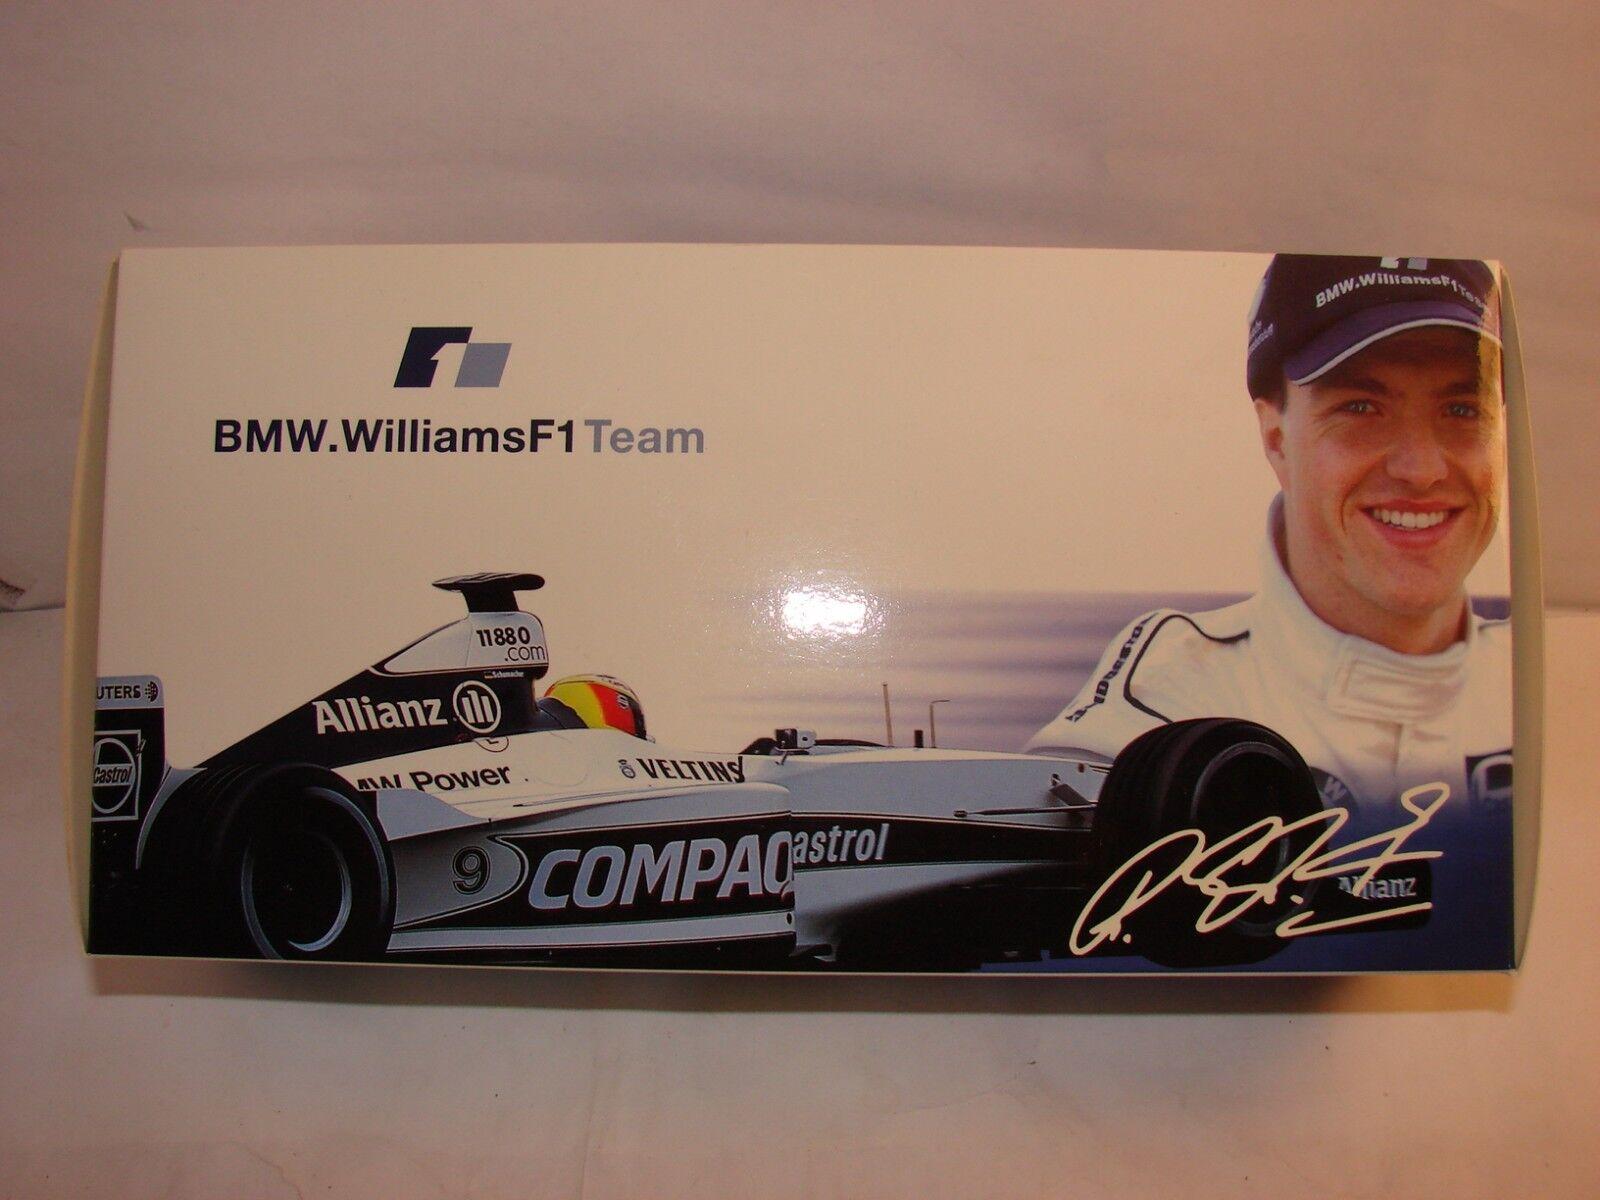 1 18 Williams BMW fw22, alliance, Ralf Schumacher, Minichamps dans neuf dans sa boîte